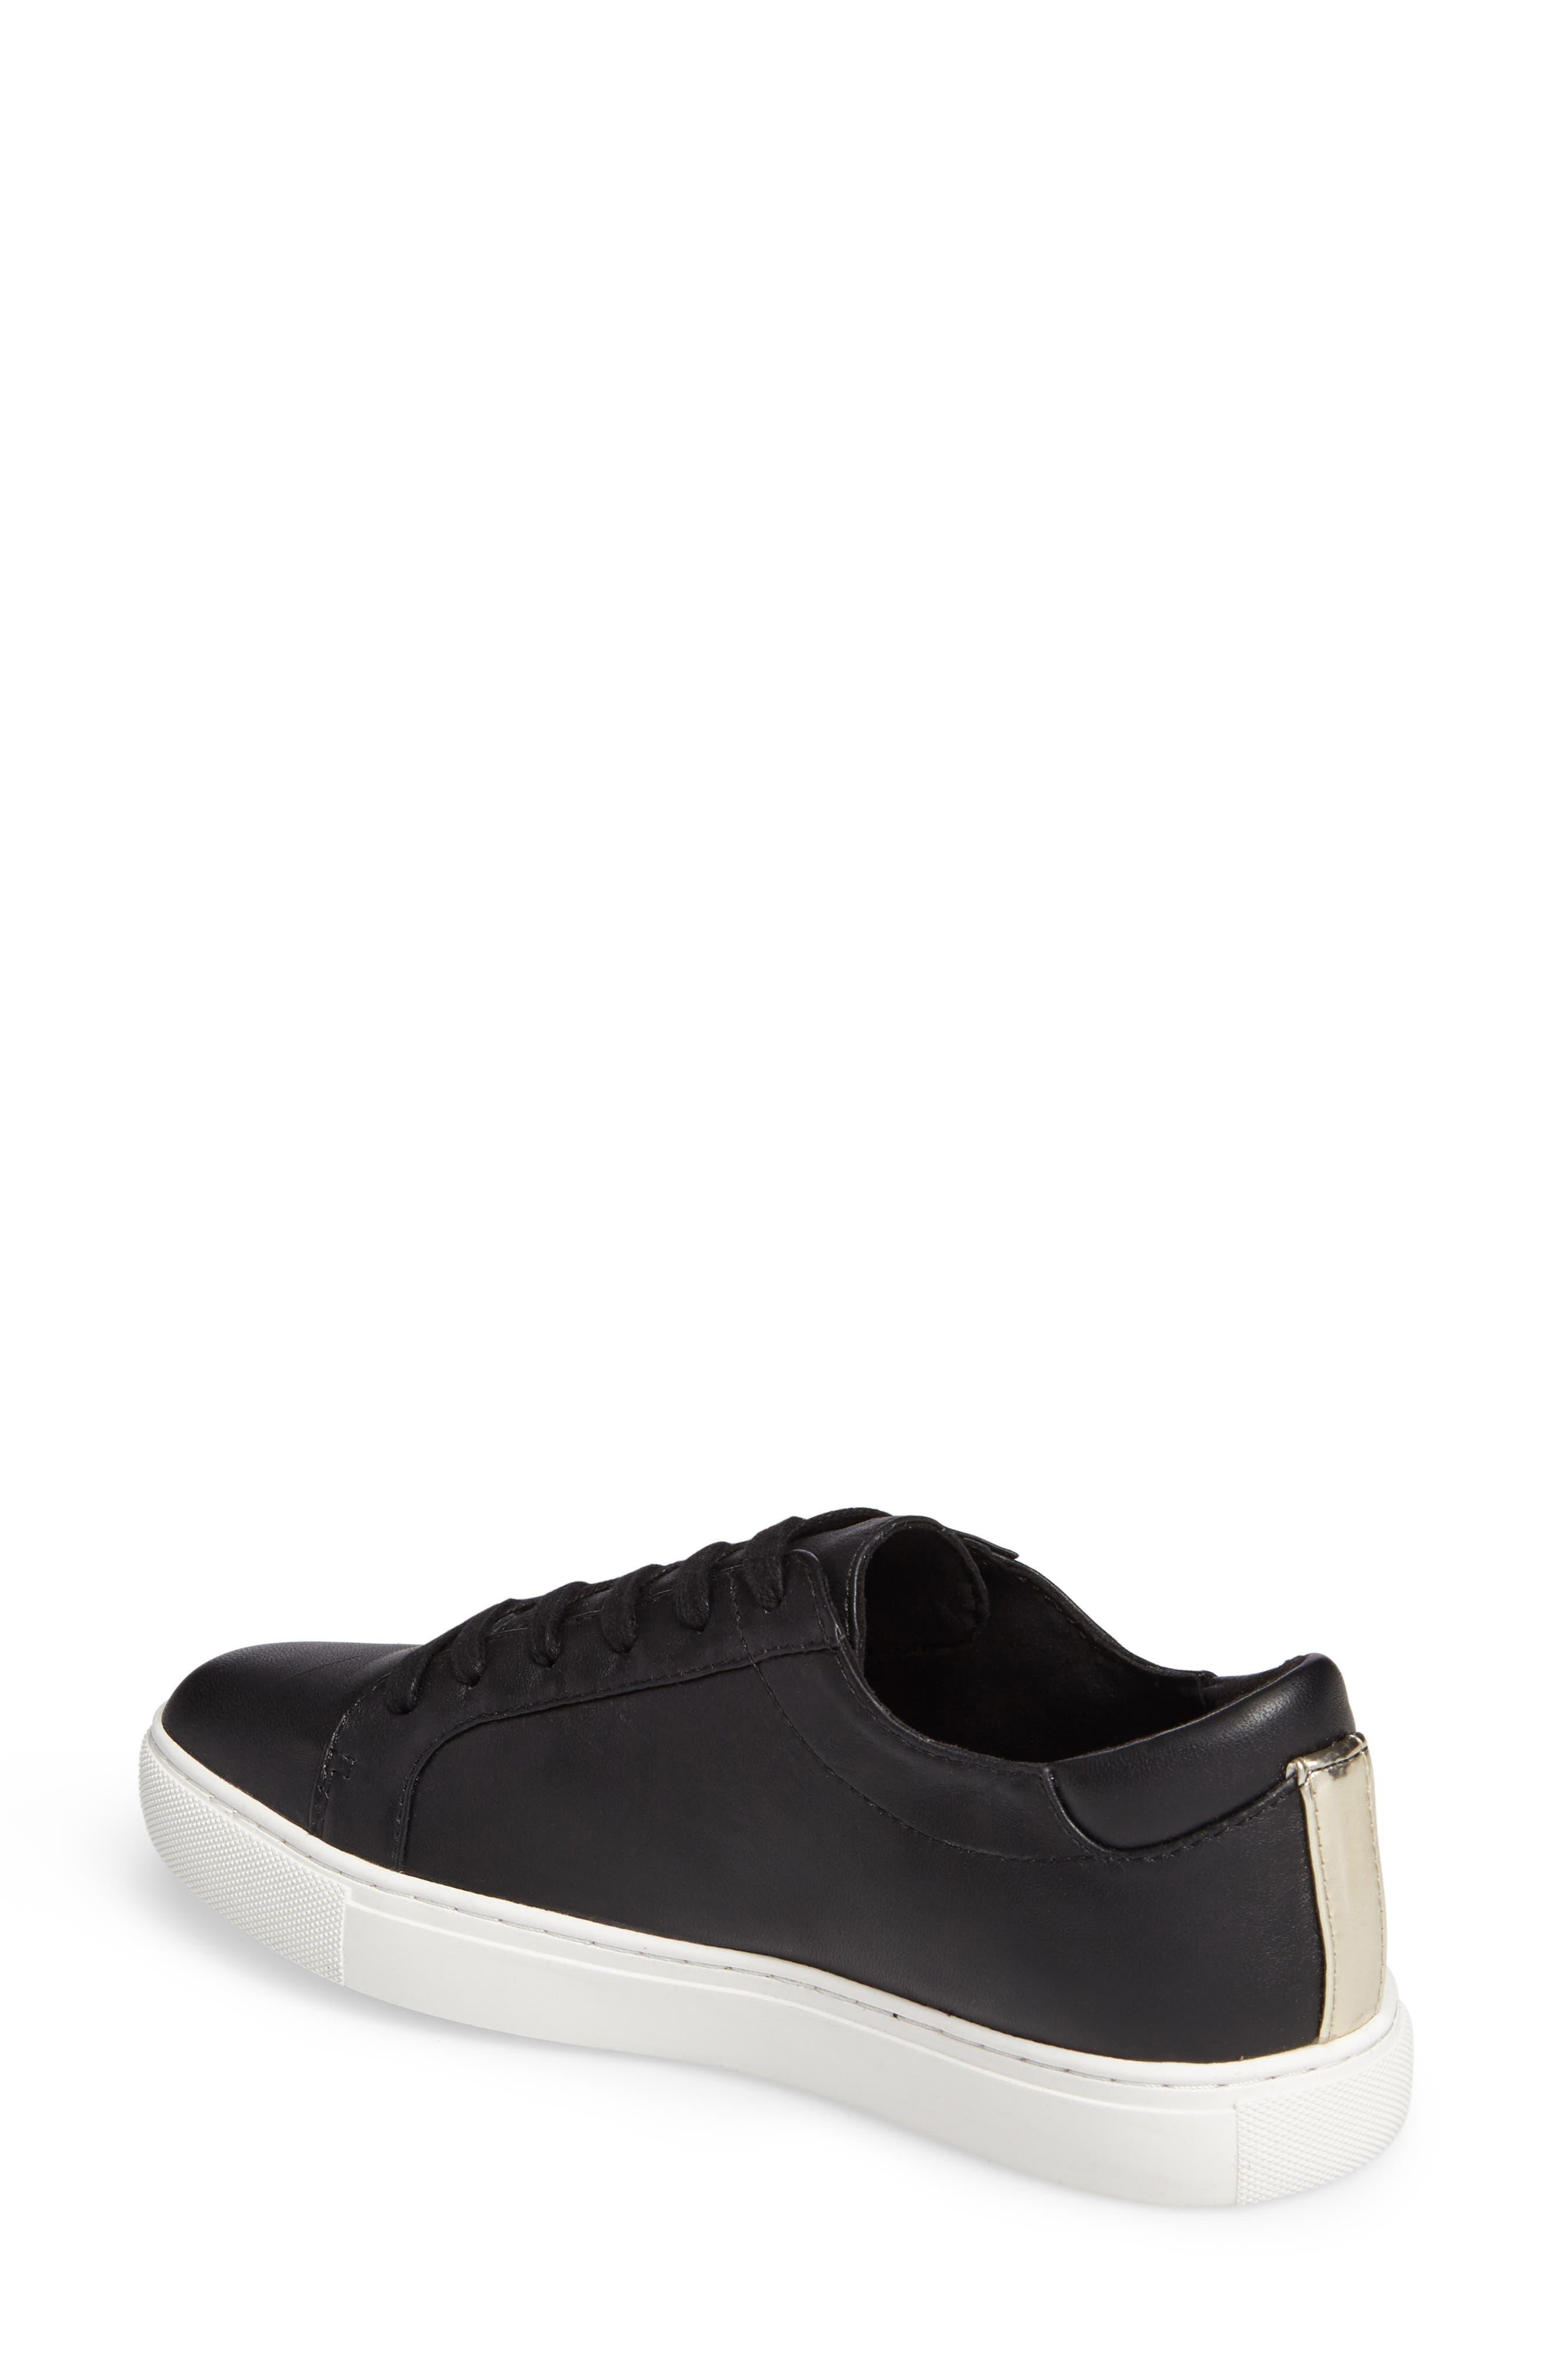 Kam NYC Sneaker,                             Alternate thumbnail 2, color,                             001